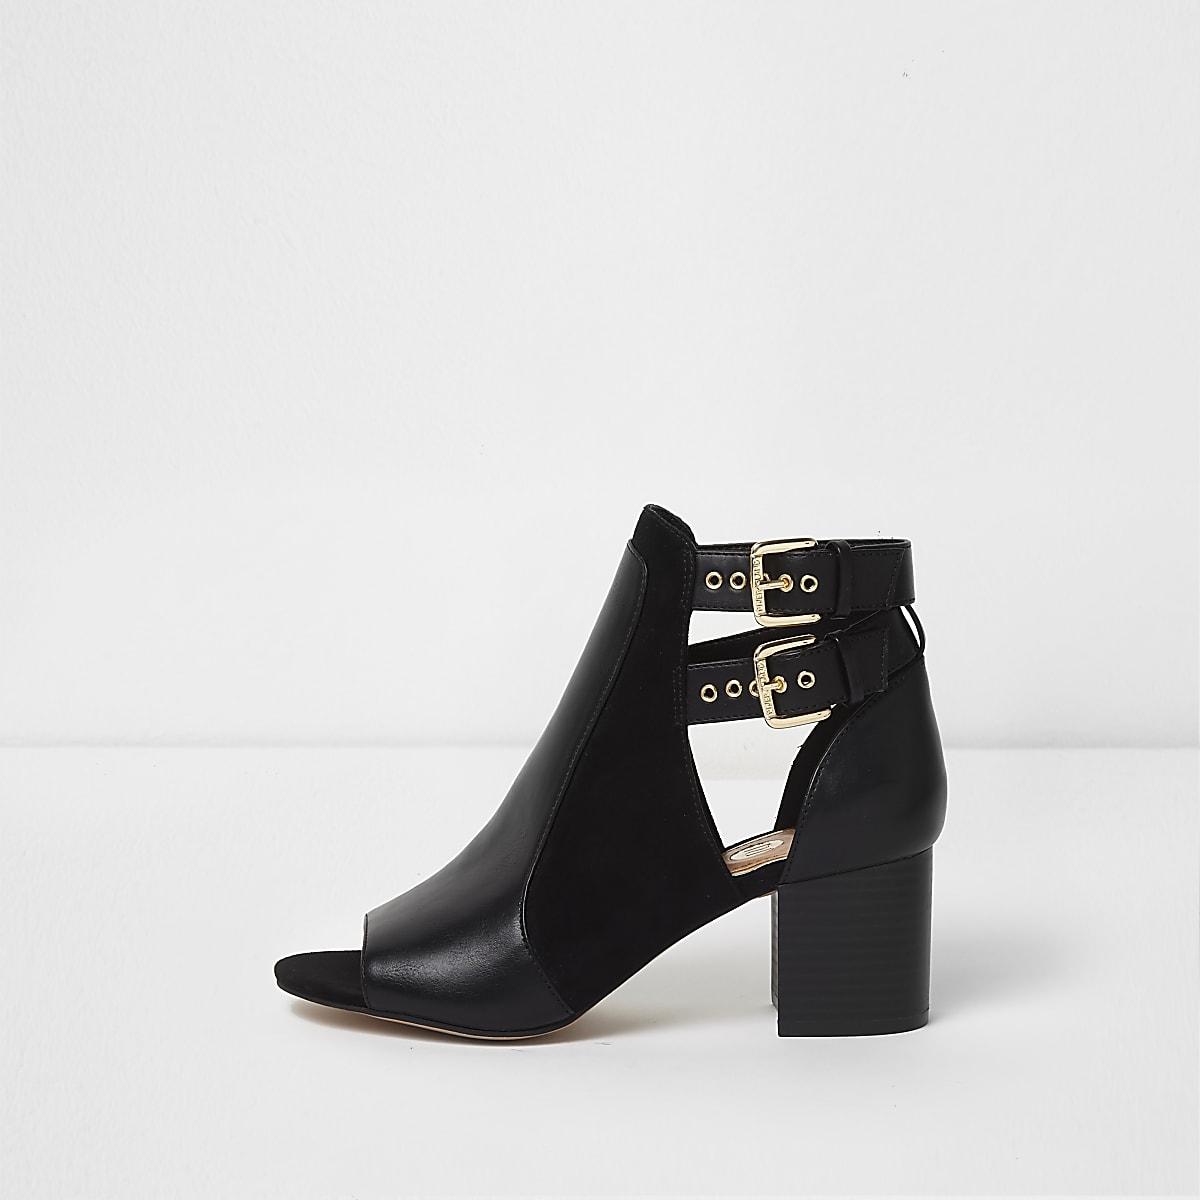 Black double buckle peep toe shoe boots